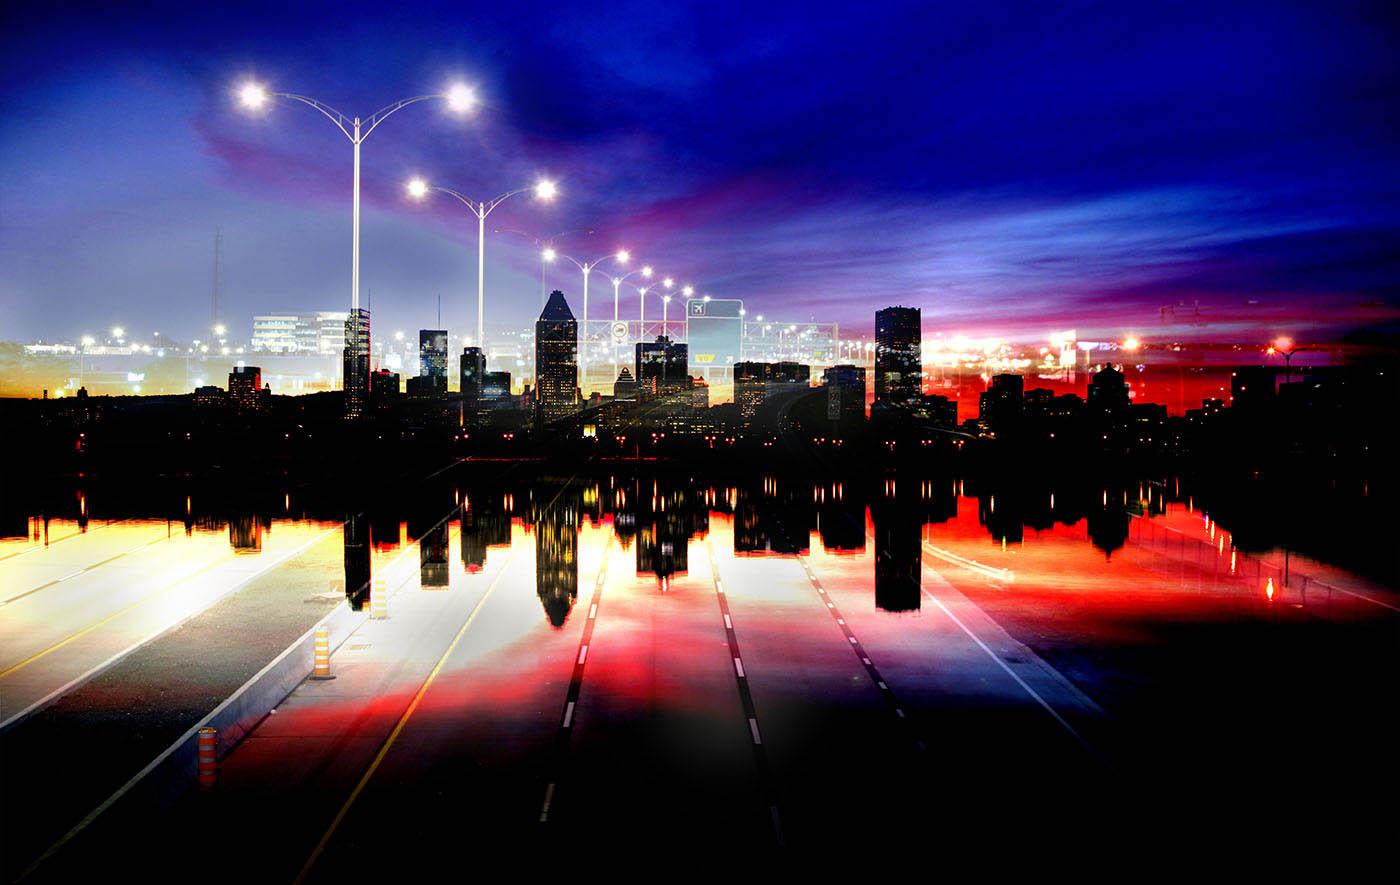 Montreal City Urban Montage 05 - Stock Photography